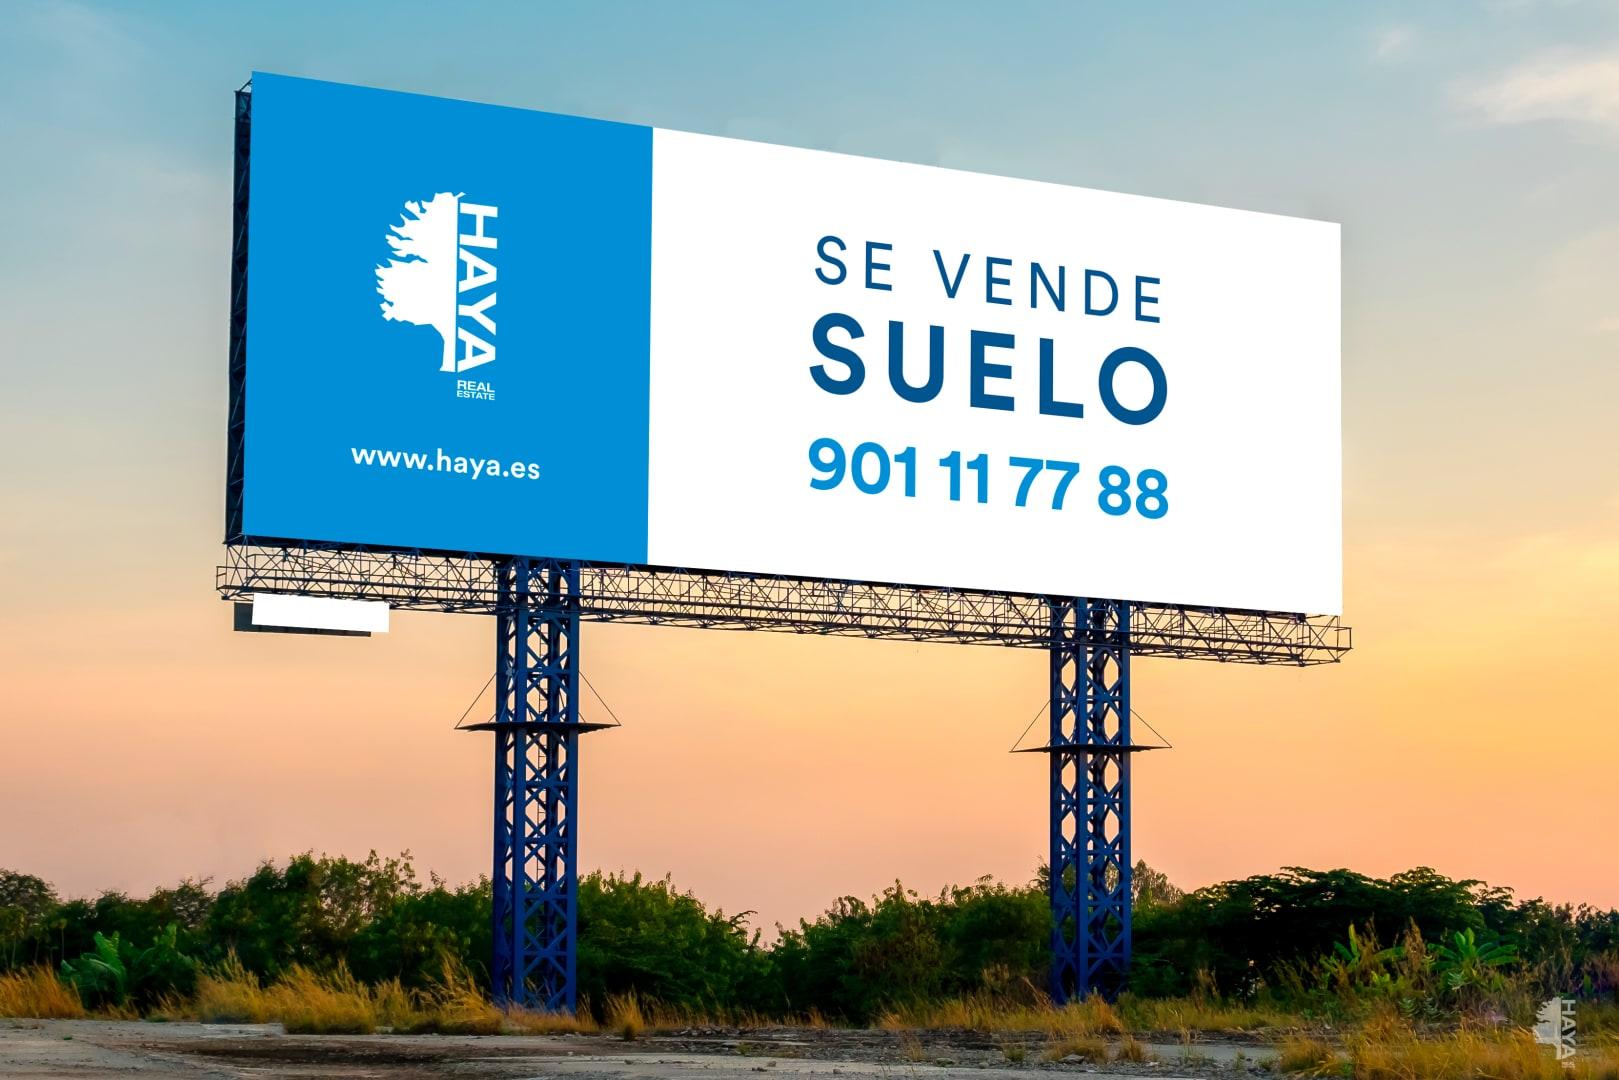 Solar urbano en Xixona. Solar en venta en jijona/xixona (alicante) constitucion